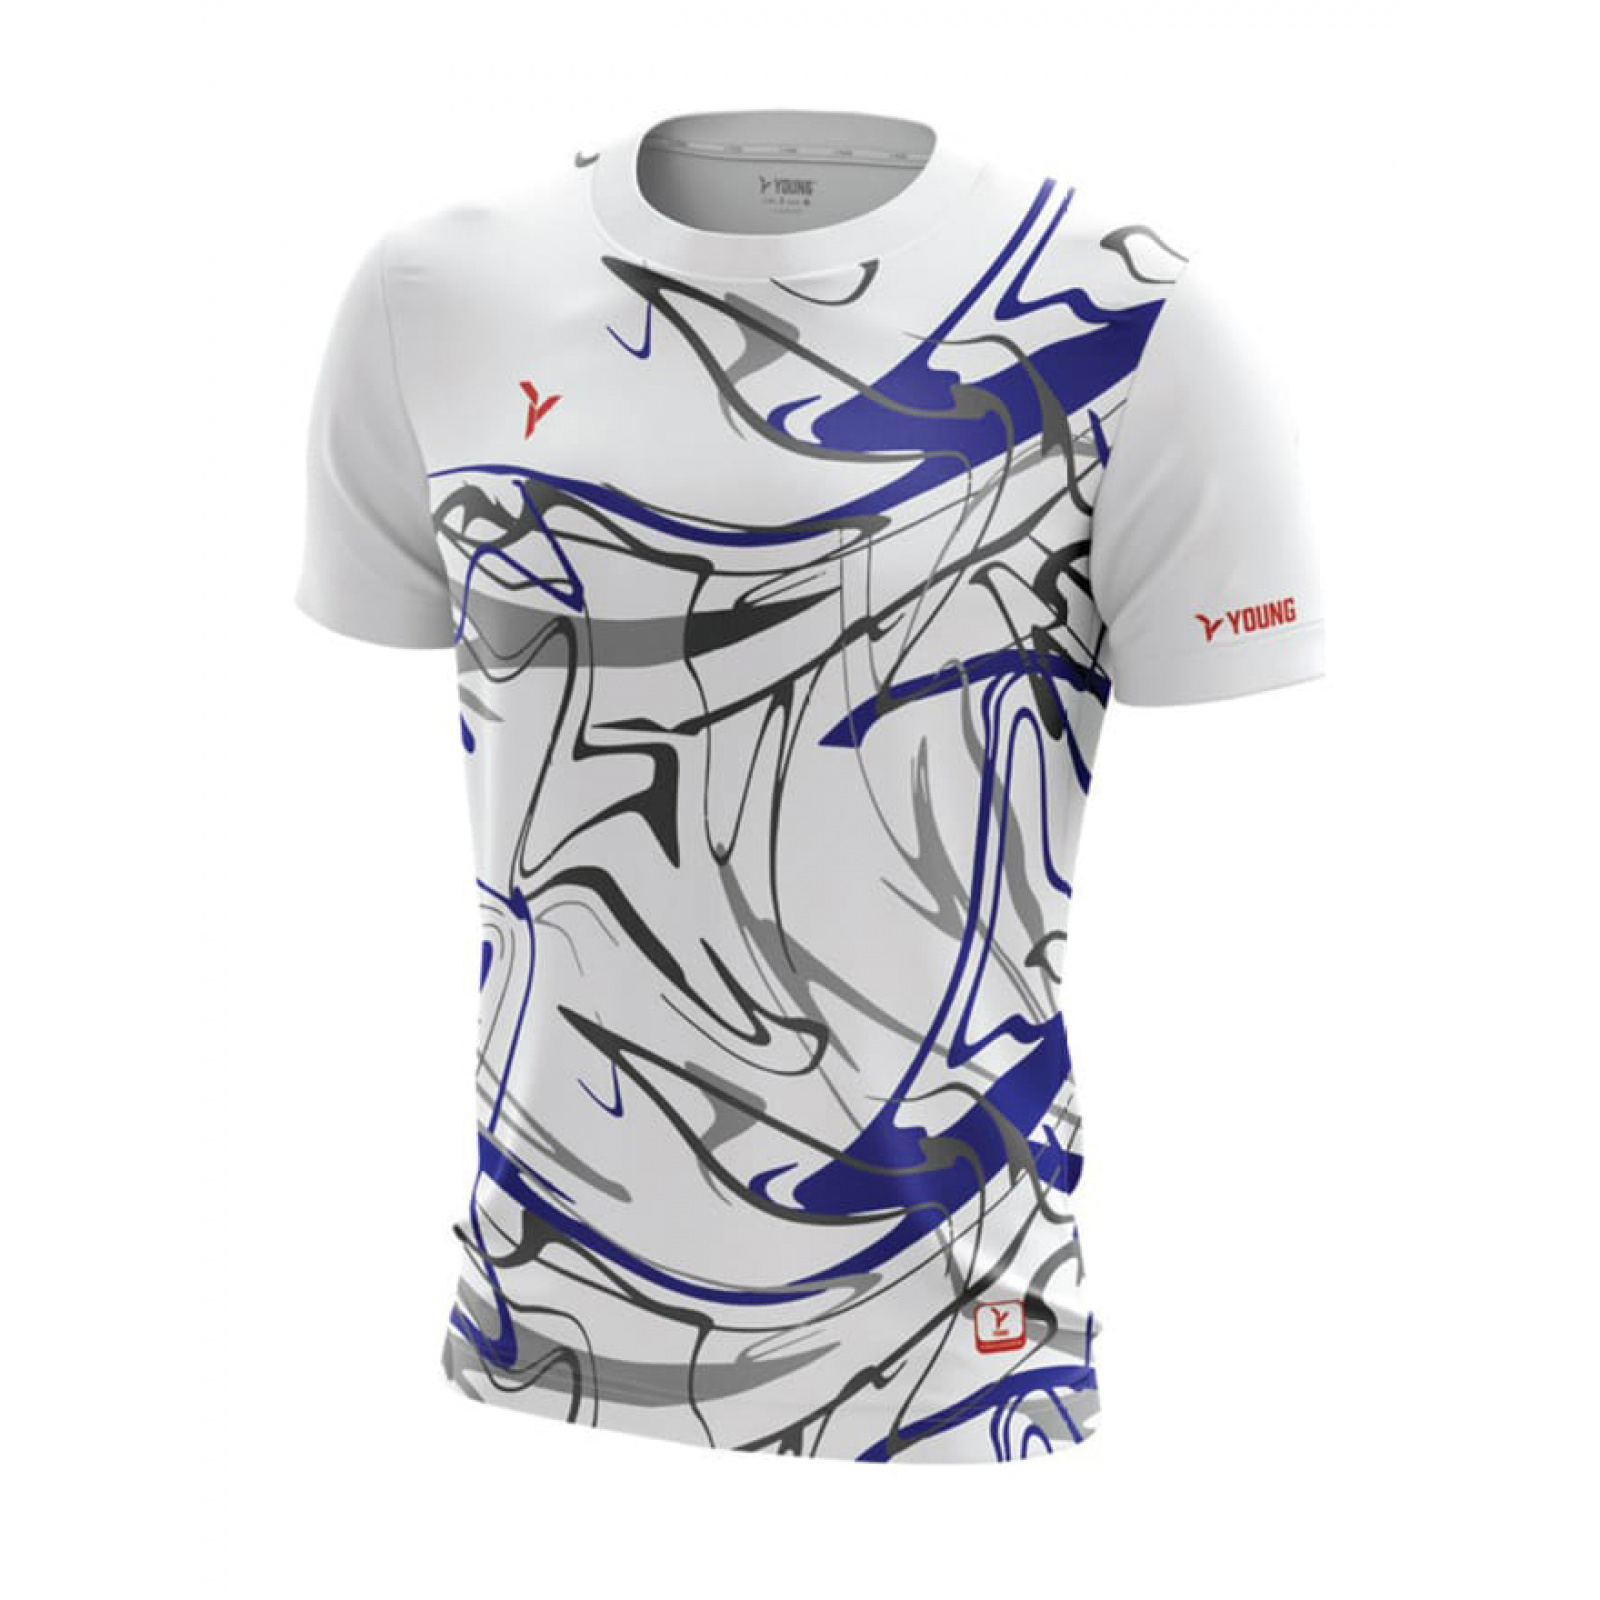 https://www.badec.store/produkty_img/badmintonove-tricko1573660008L.jpg